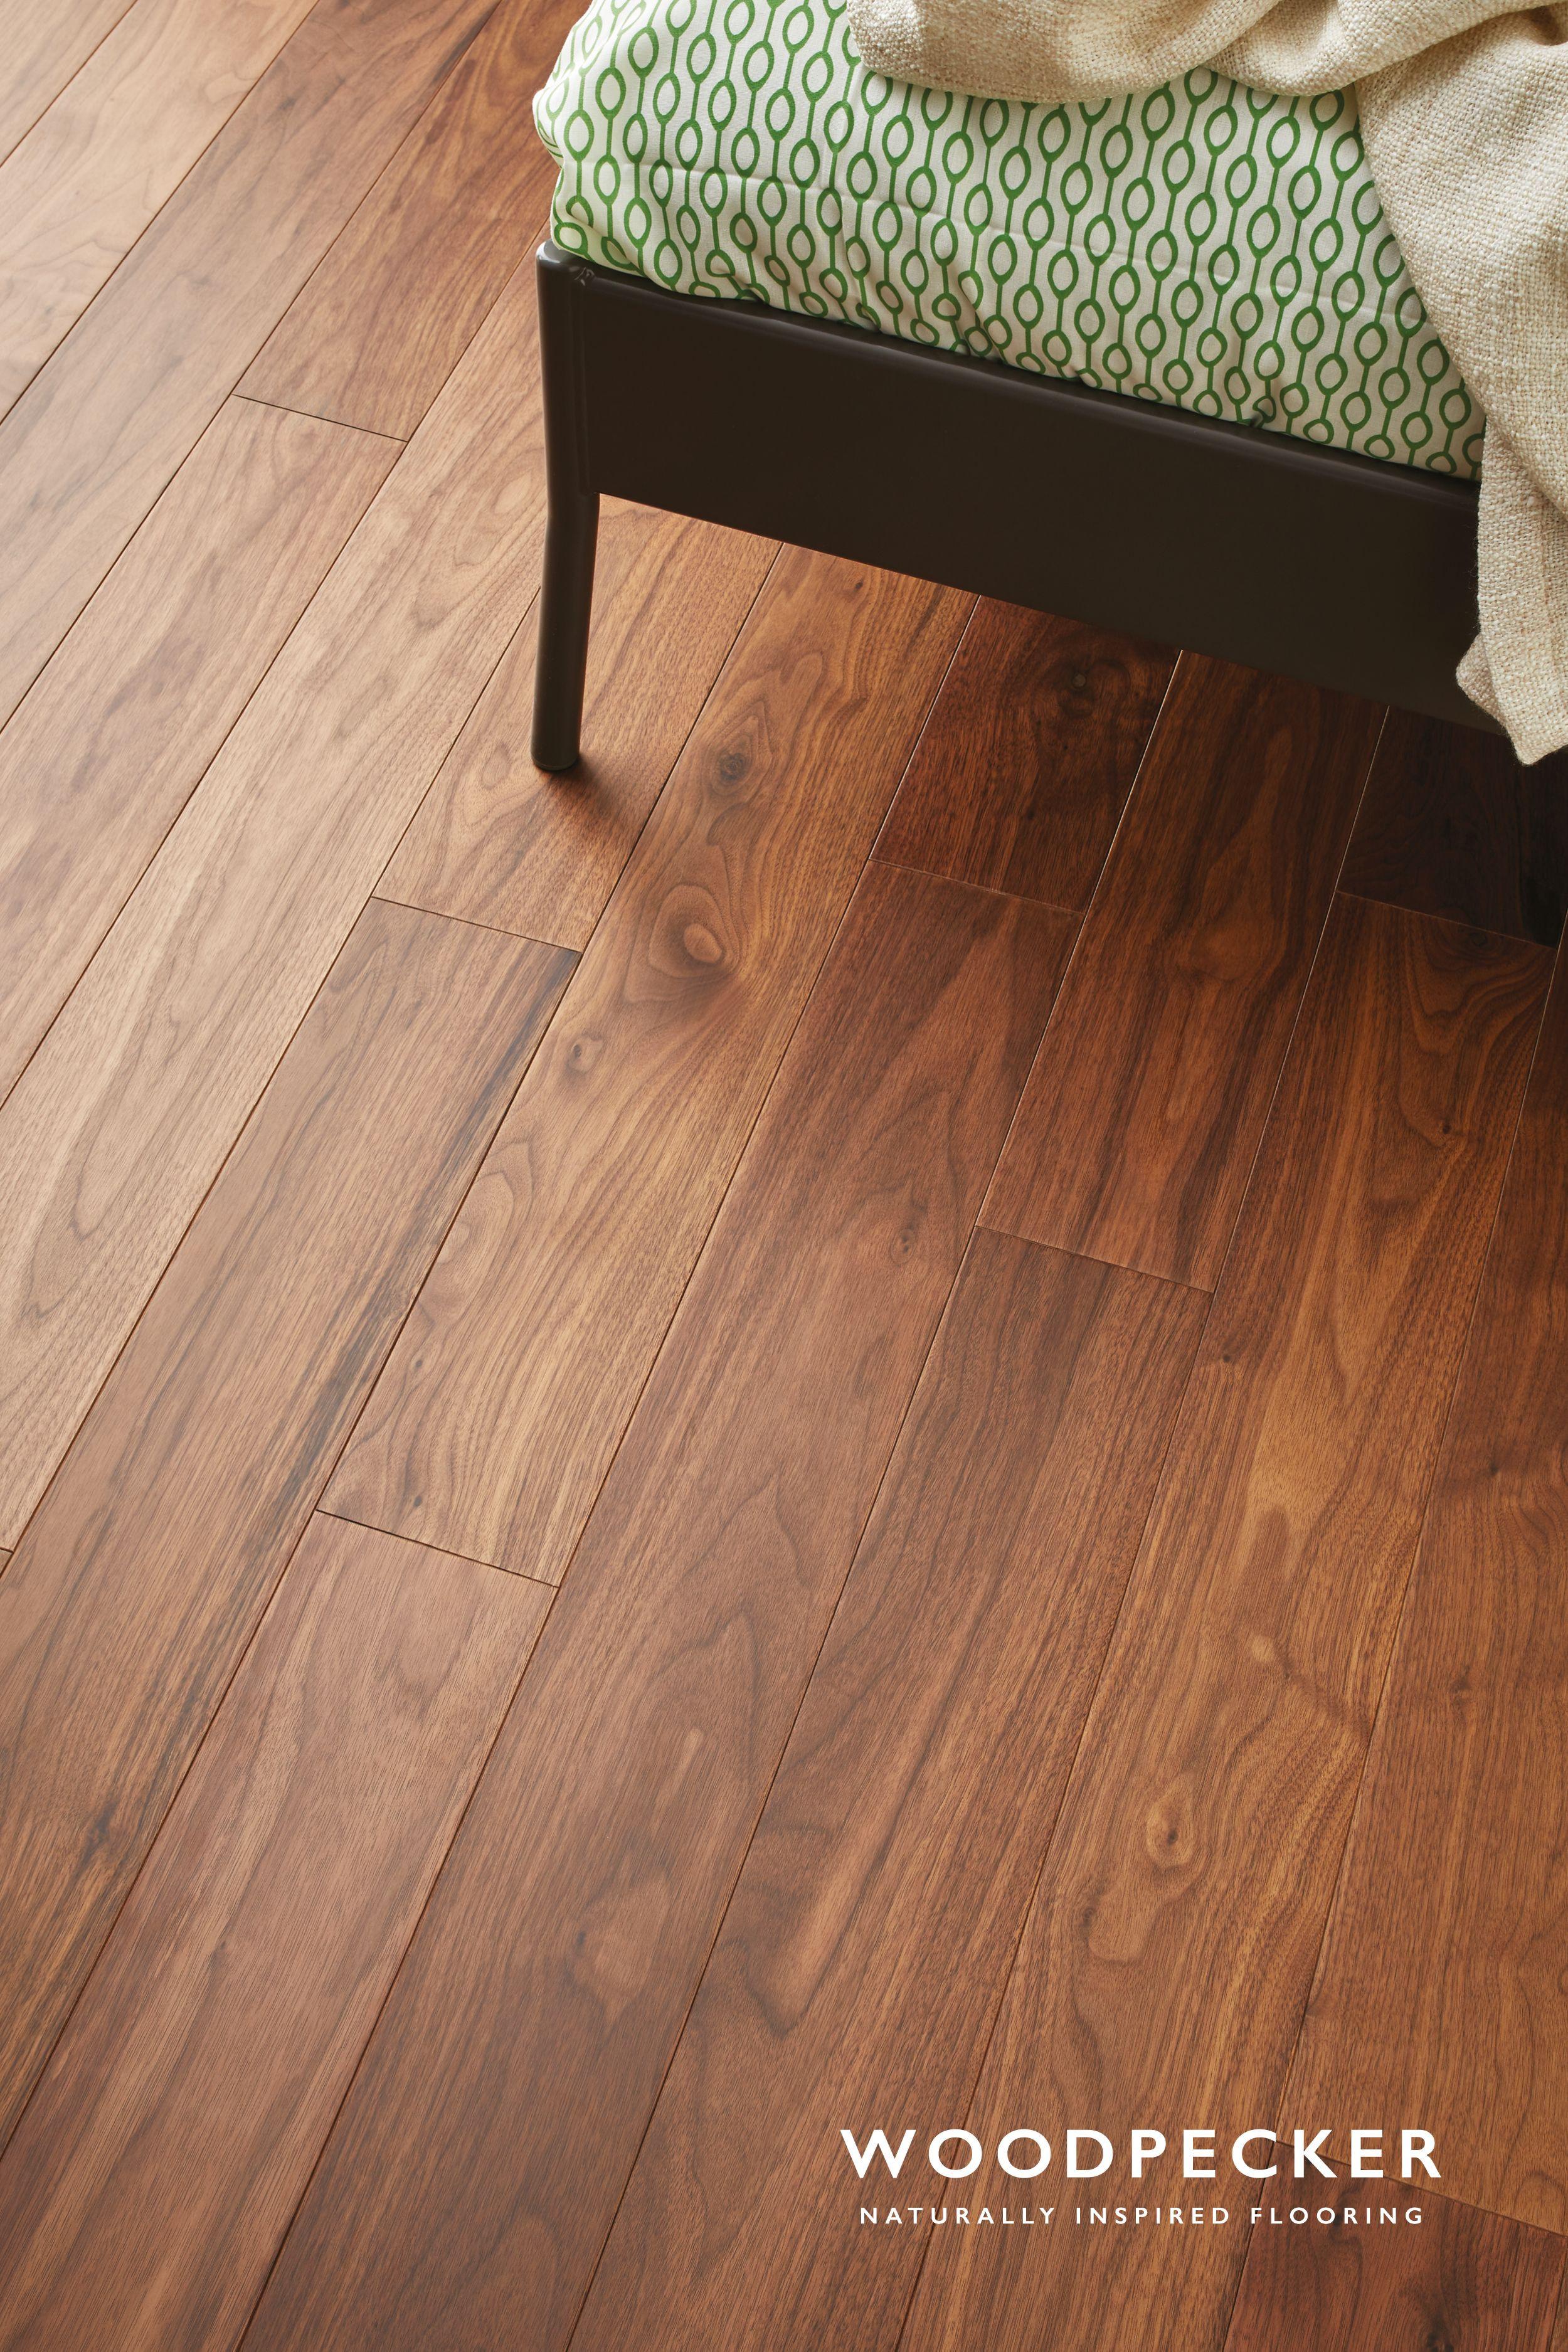 engineered hardwood flooring vs hardwood flooring of raglan walnut exotic engineered wood and wood flooring with walnut flooring is exotic and exciting with wide flowing grain patterns and a medley chocolate